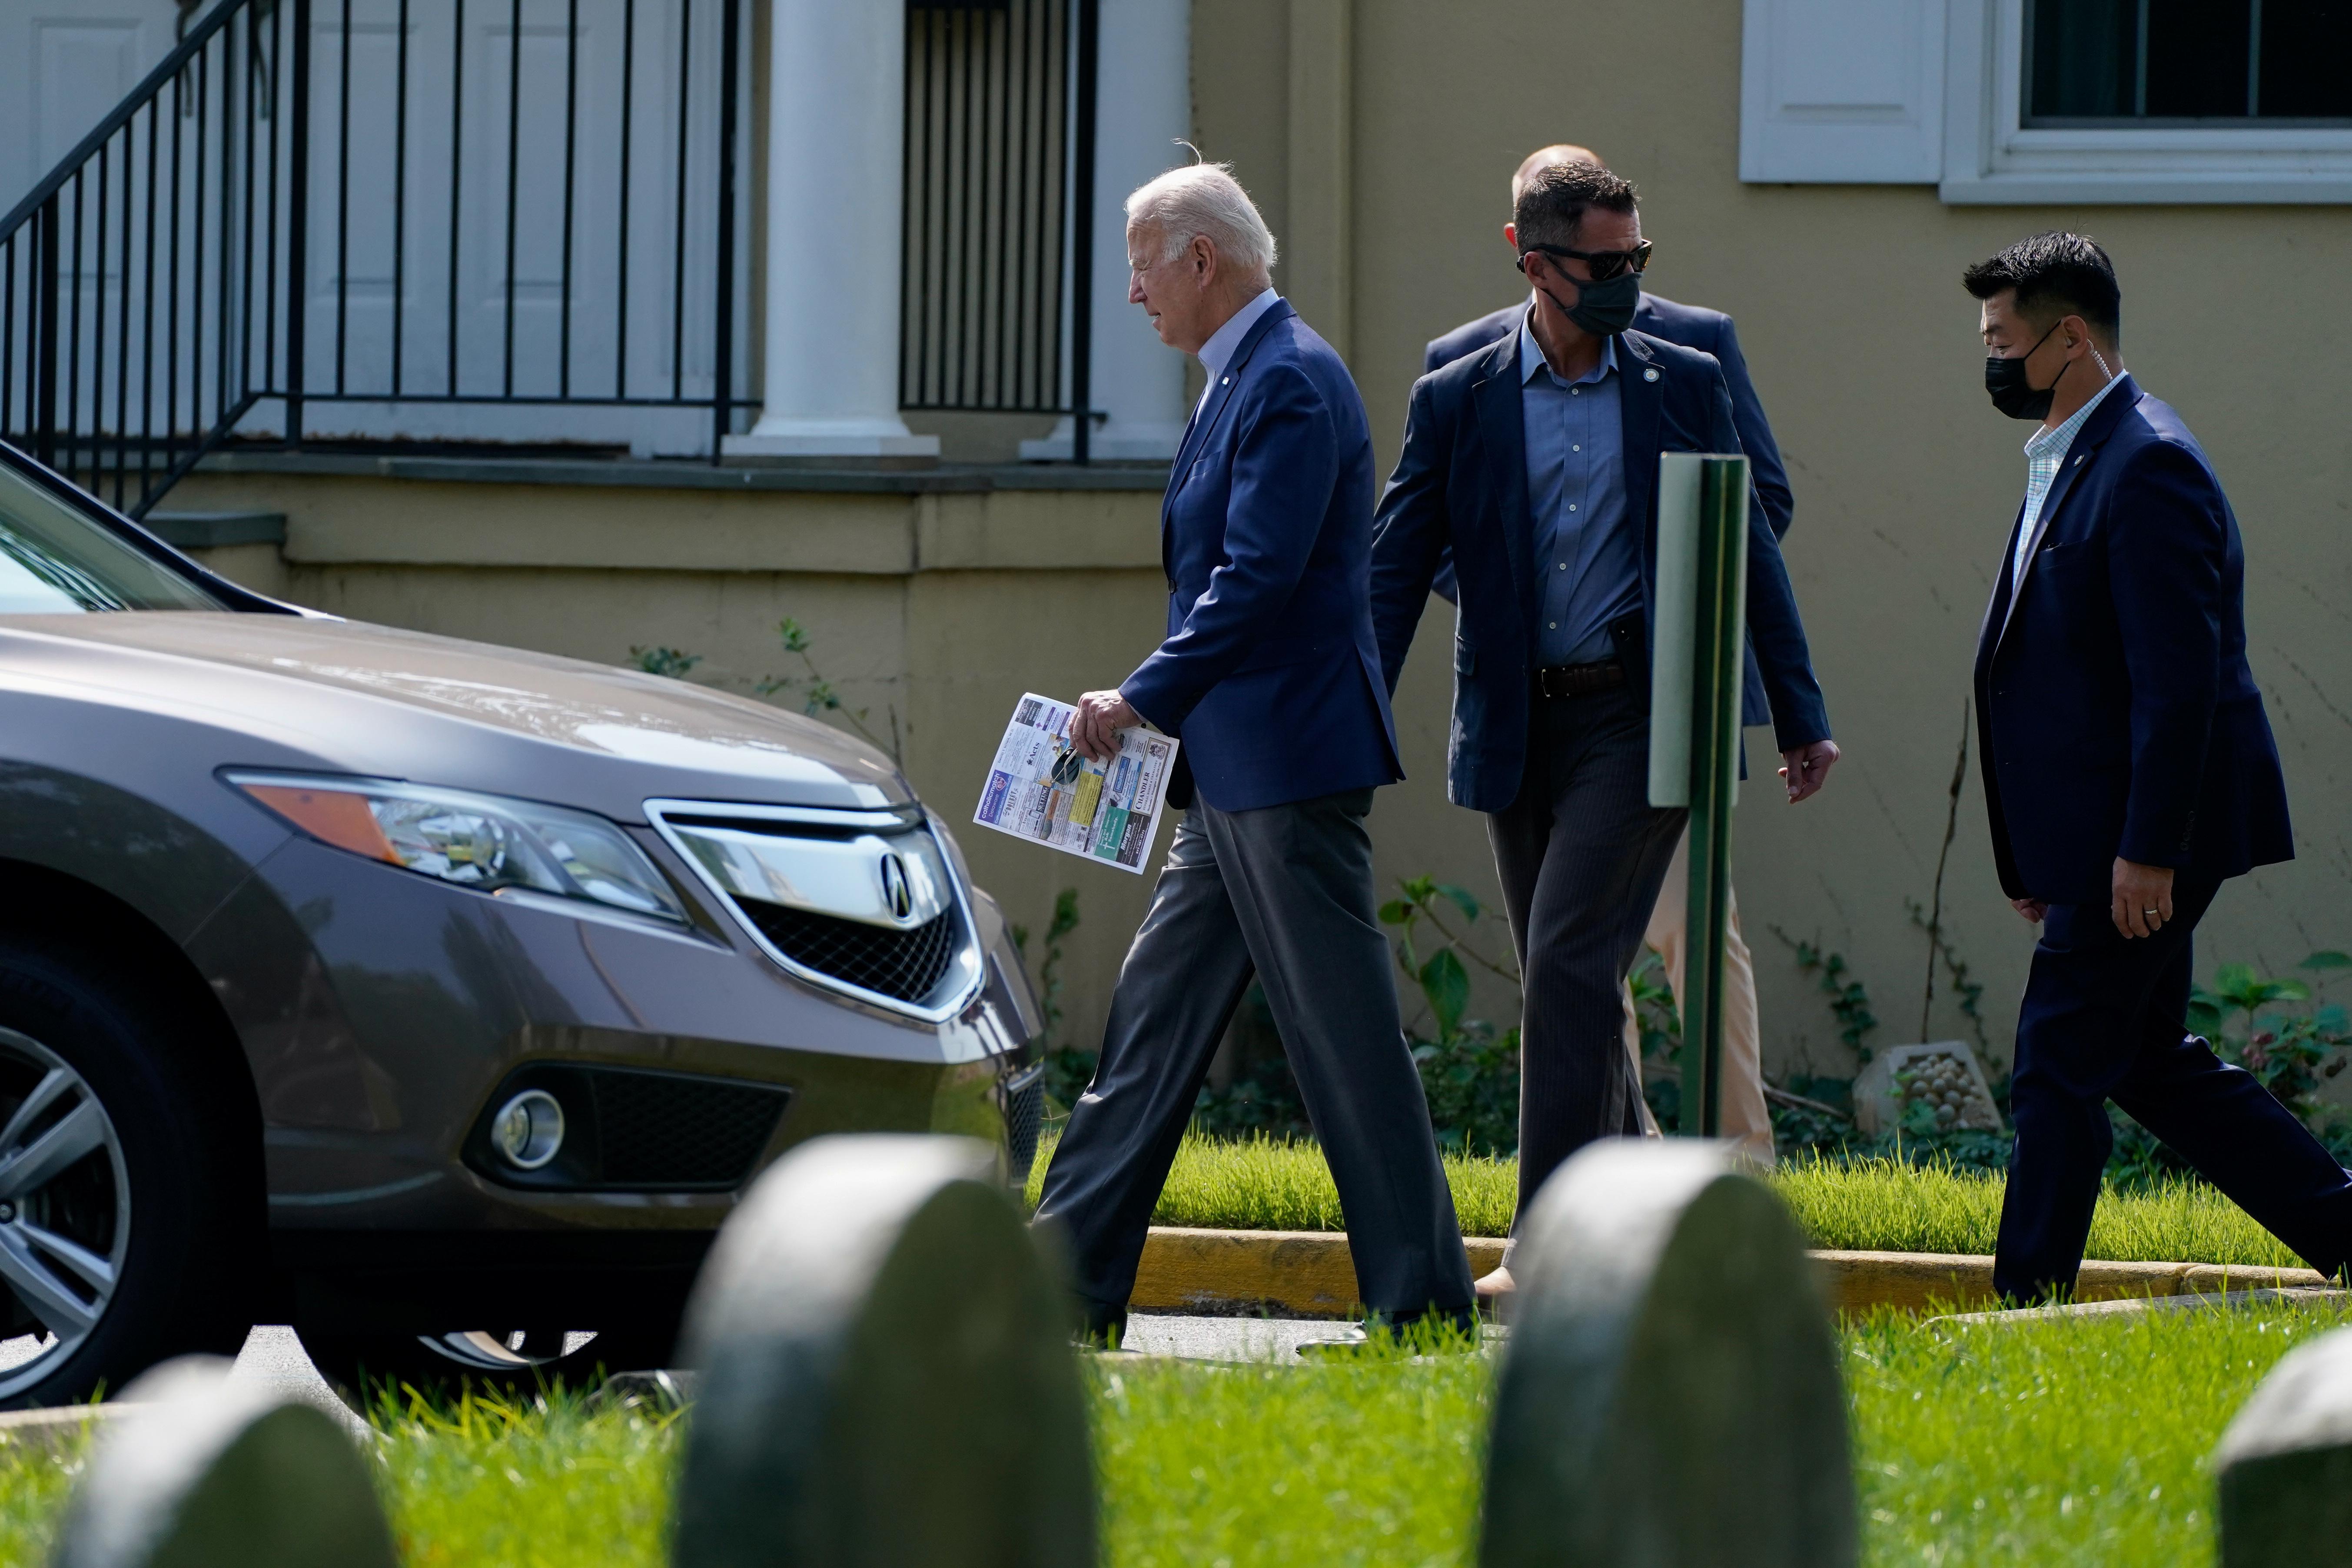 U.S. President Joe Biden leaves St. Joseph on the Brandywine Catholic Church after attending Mass in Wilmington, Delaware, U.S., September 12, 2021. REUTERS/Elizabeth Frantz